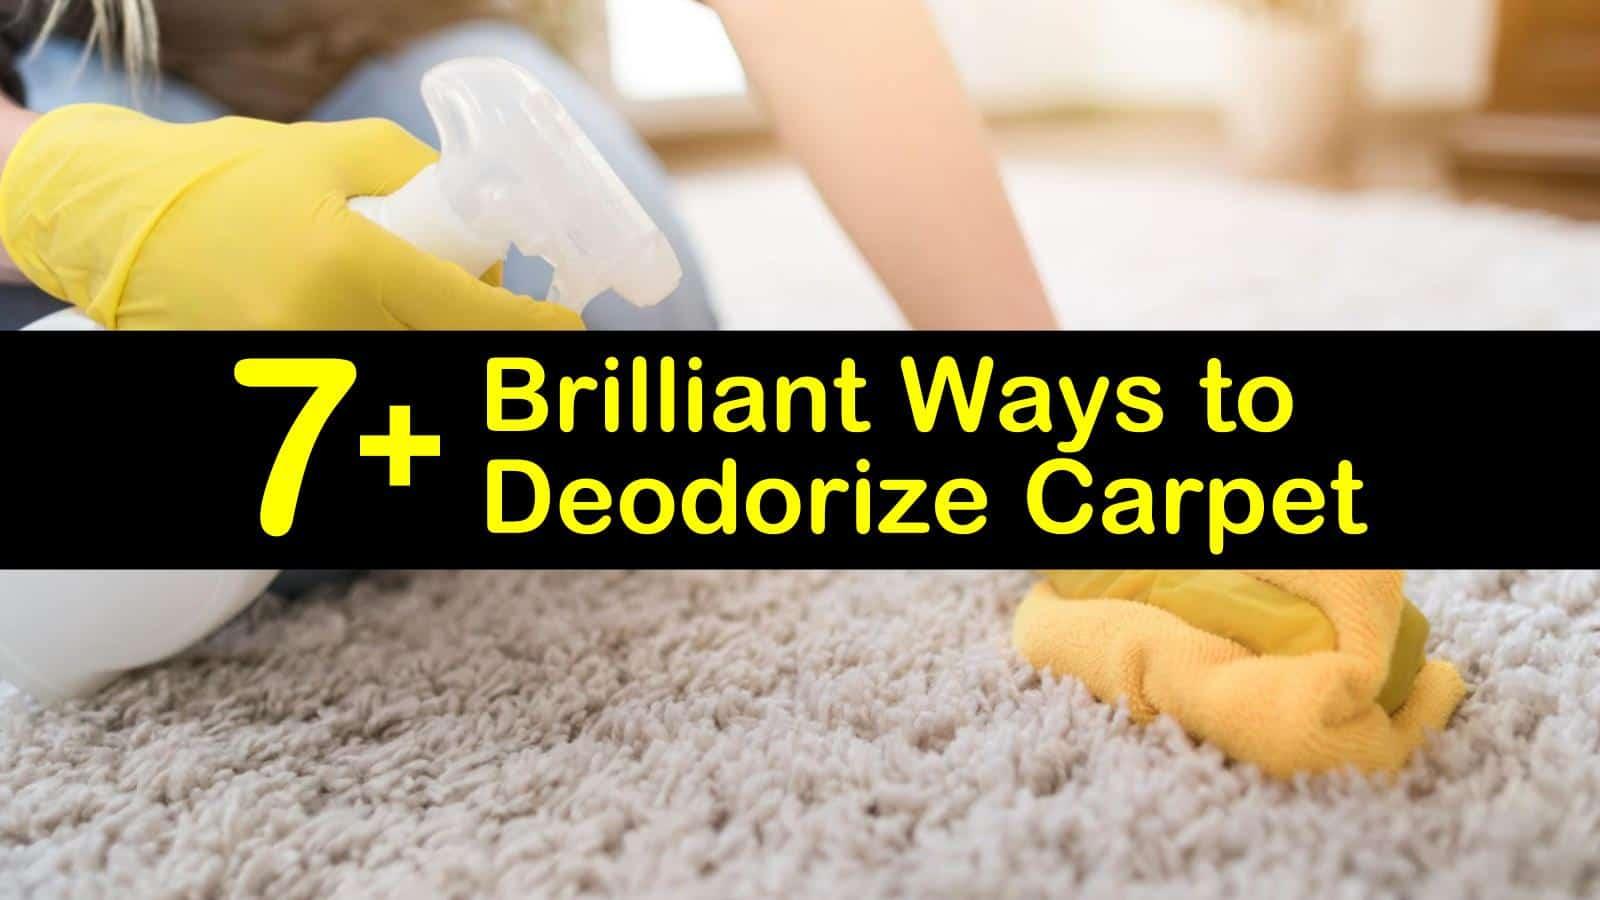 how to deodorize carpet titleimg1